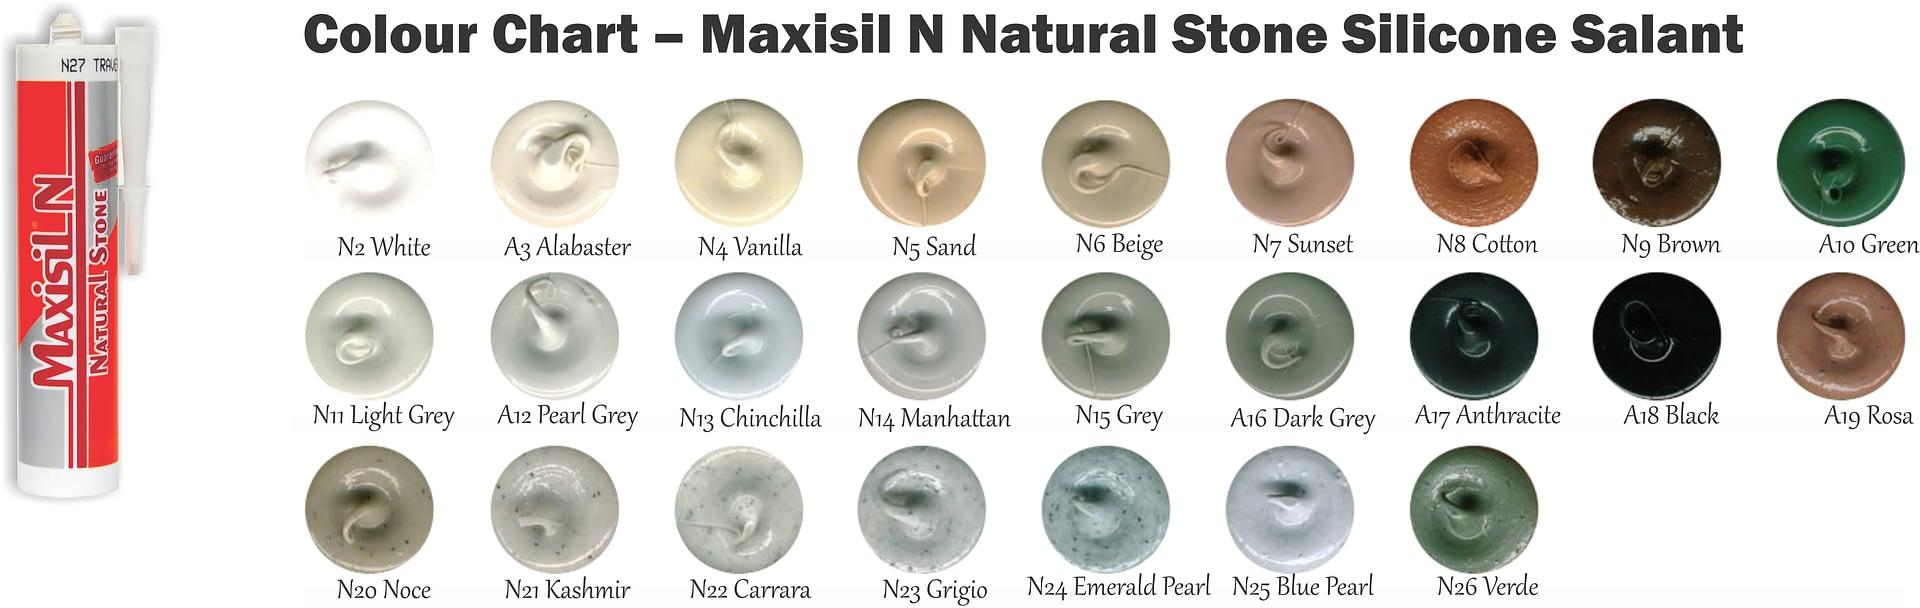 Colour Chart – Maxisil N Natural Stone Silicone Salant